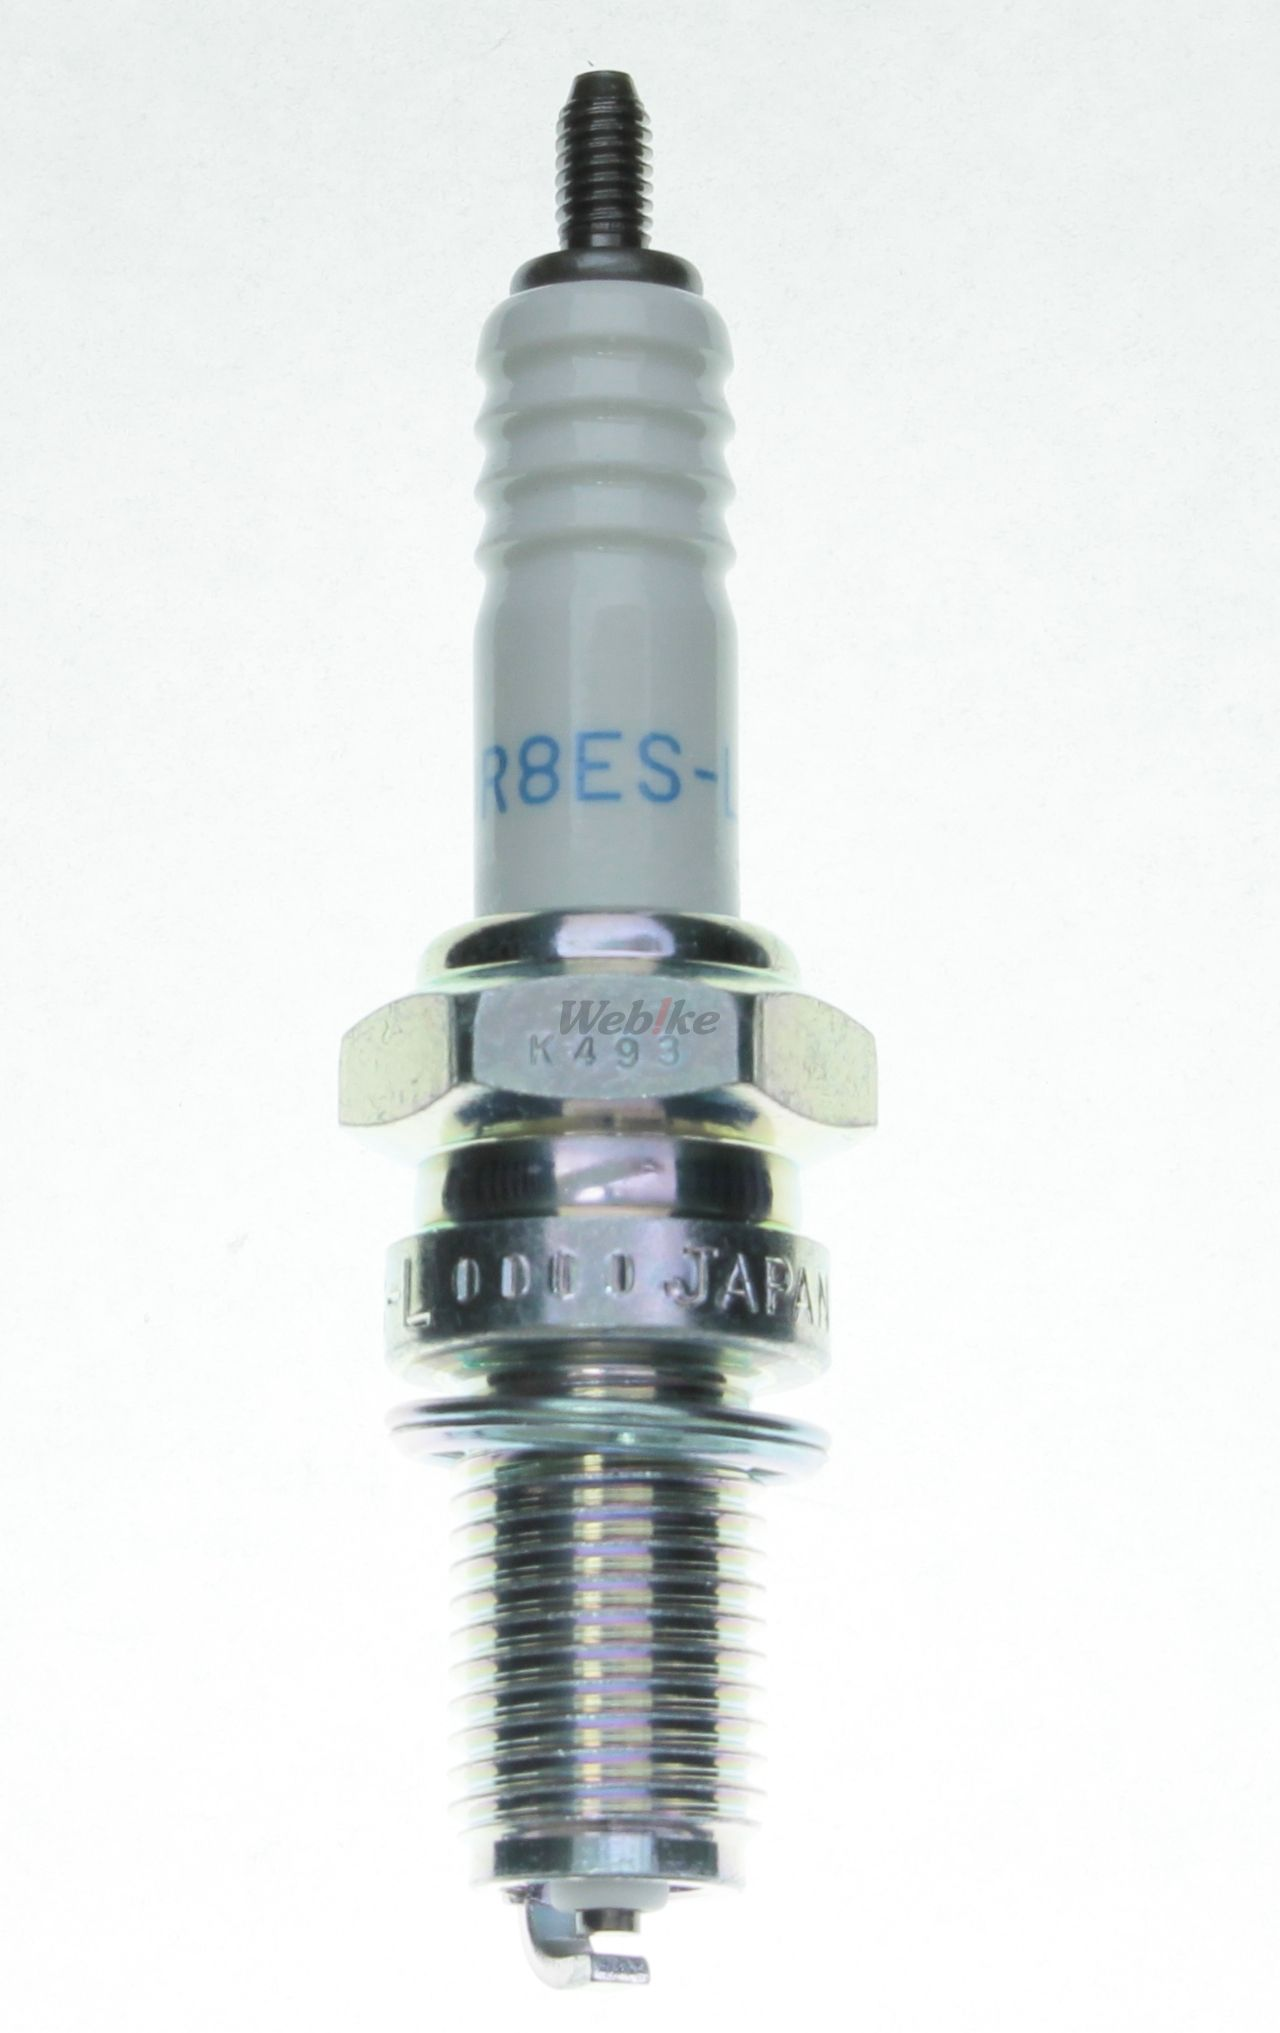 【NGK】標準型 火星塞 DR8ES-L 2923 - 「Webike-摩托百貨」